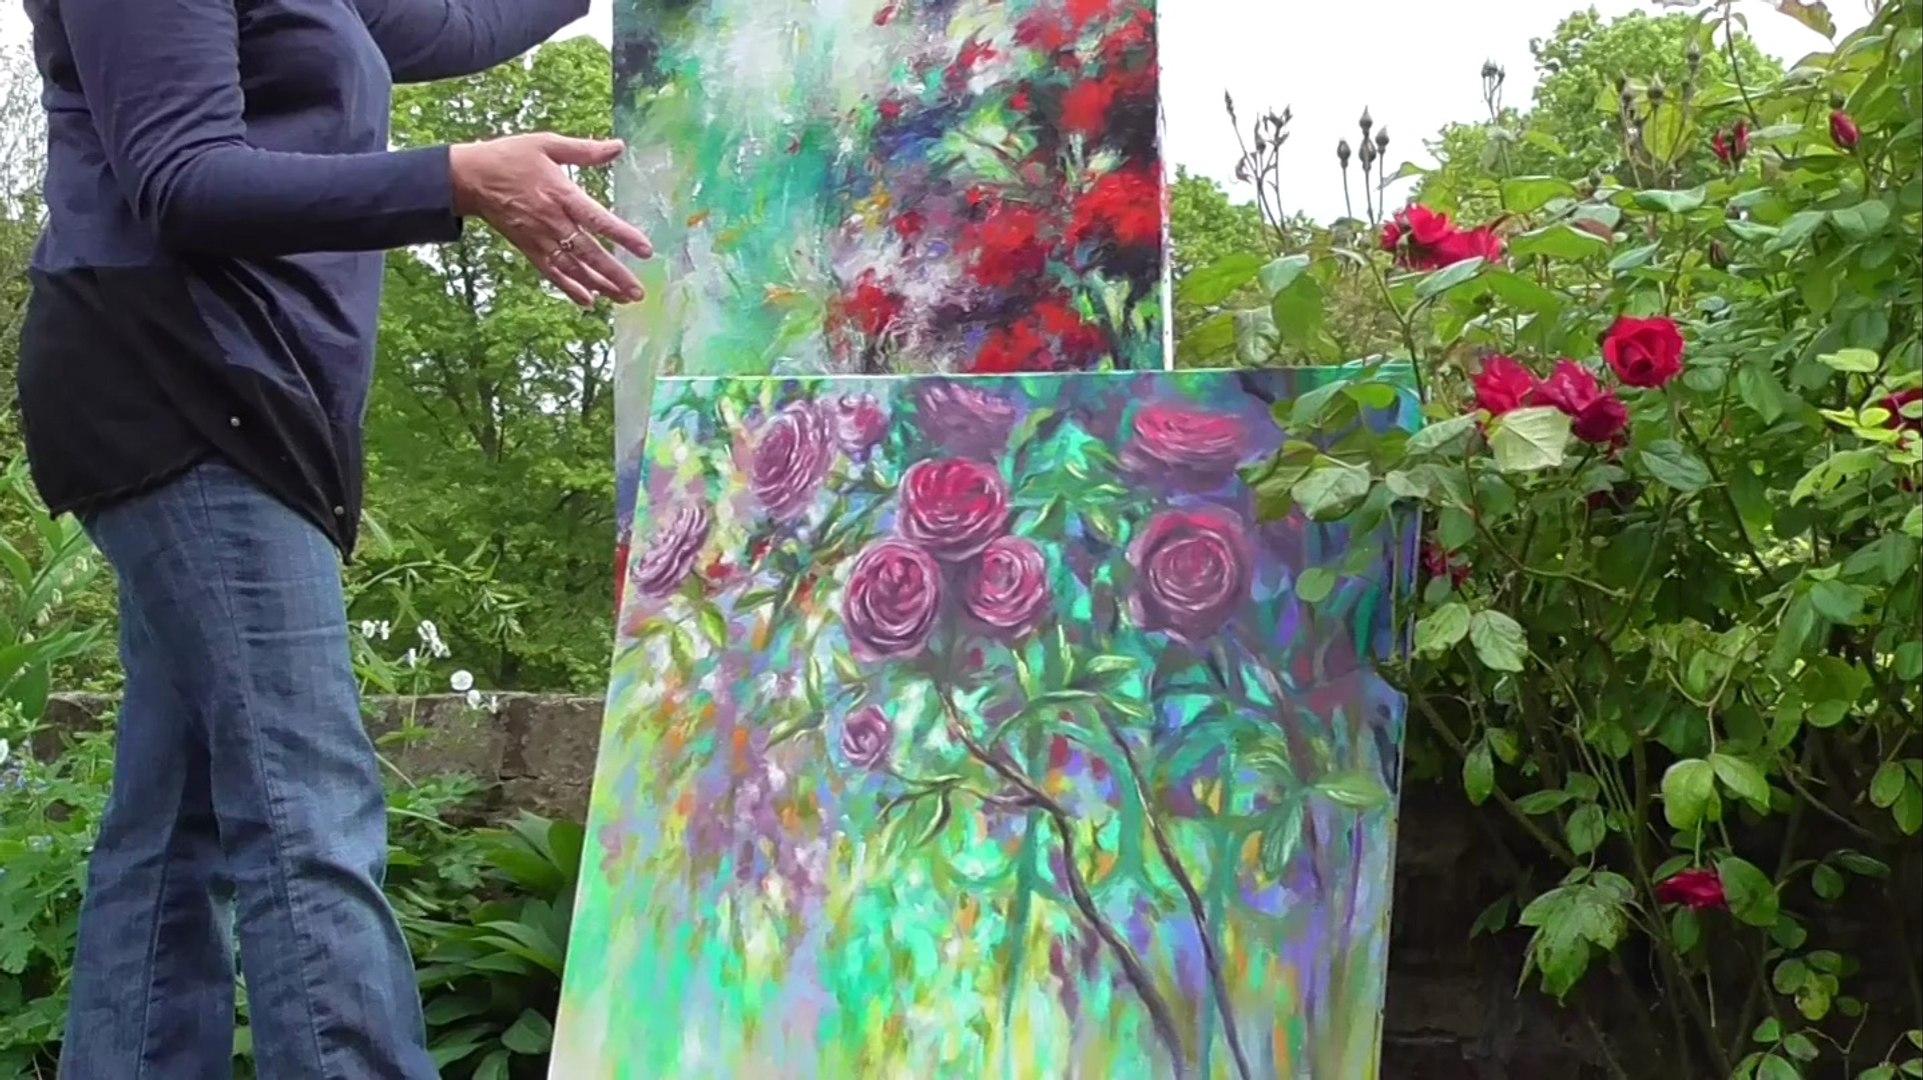 Mary Chaplin Artiste Peintre mary chaplin : nouvel atelier à wailly